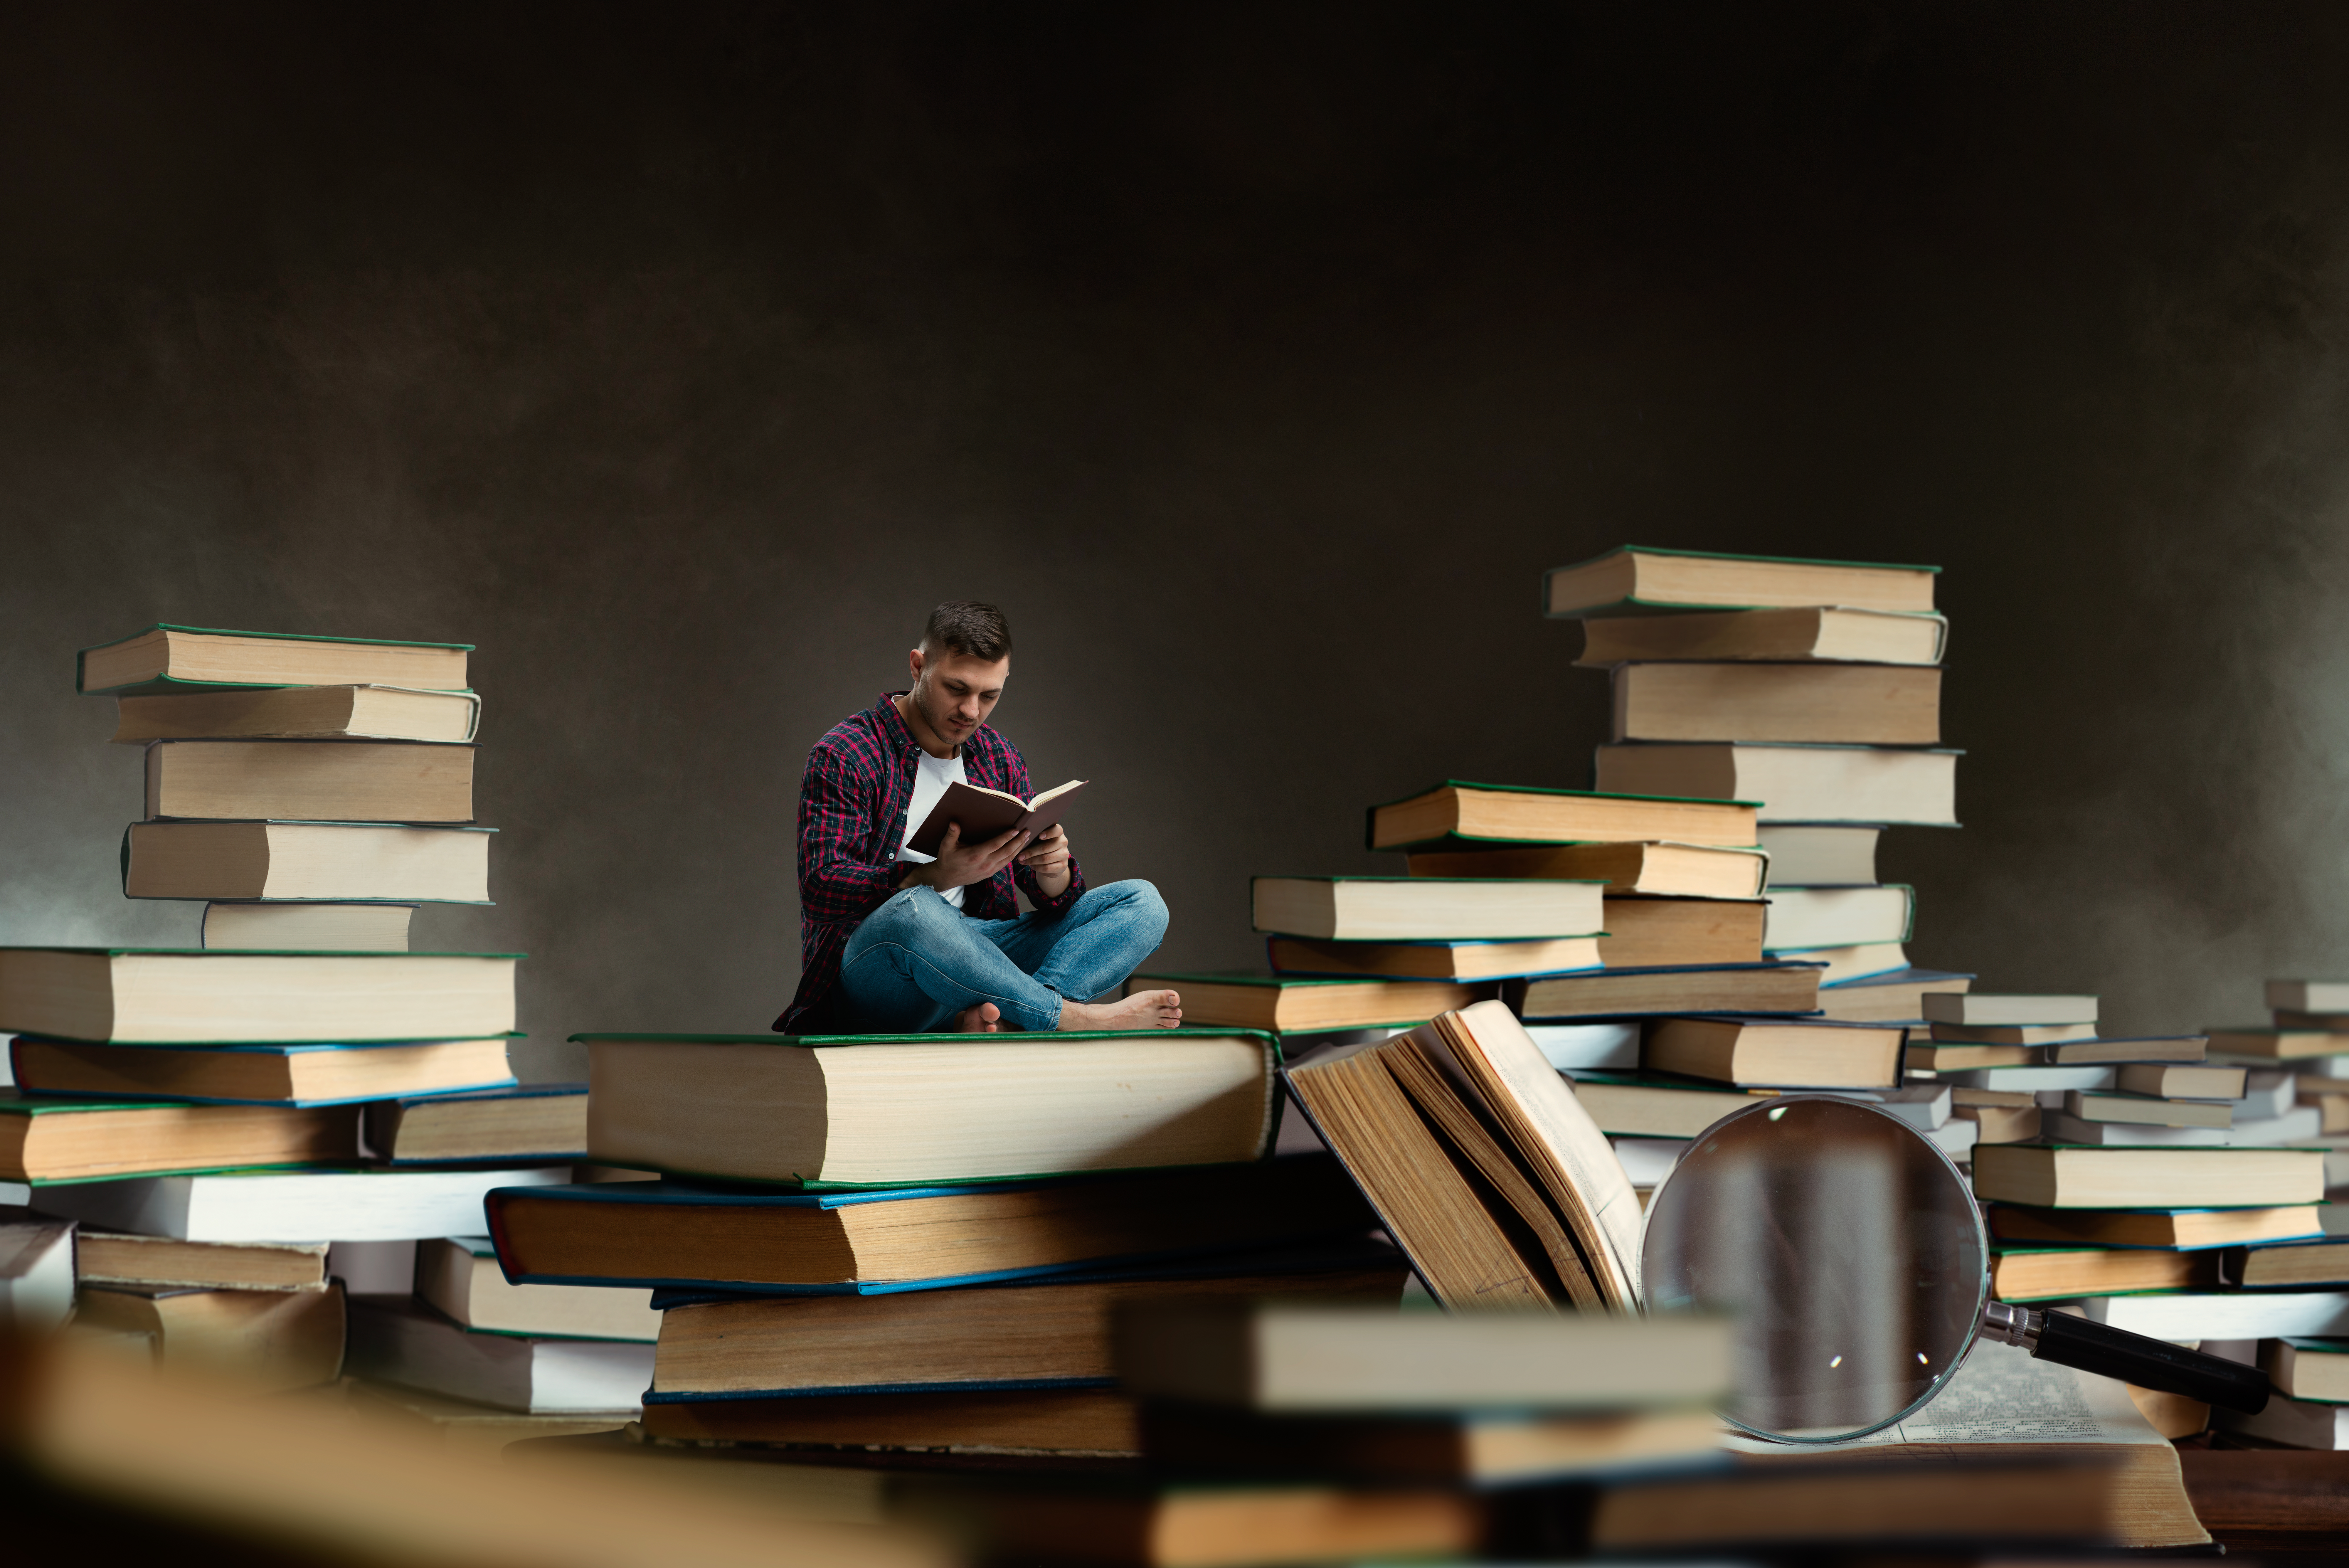 Struggling in Reading Comprehension?